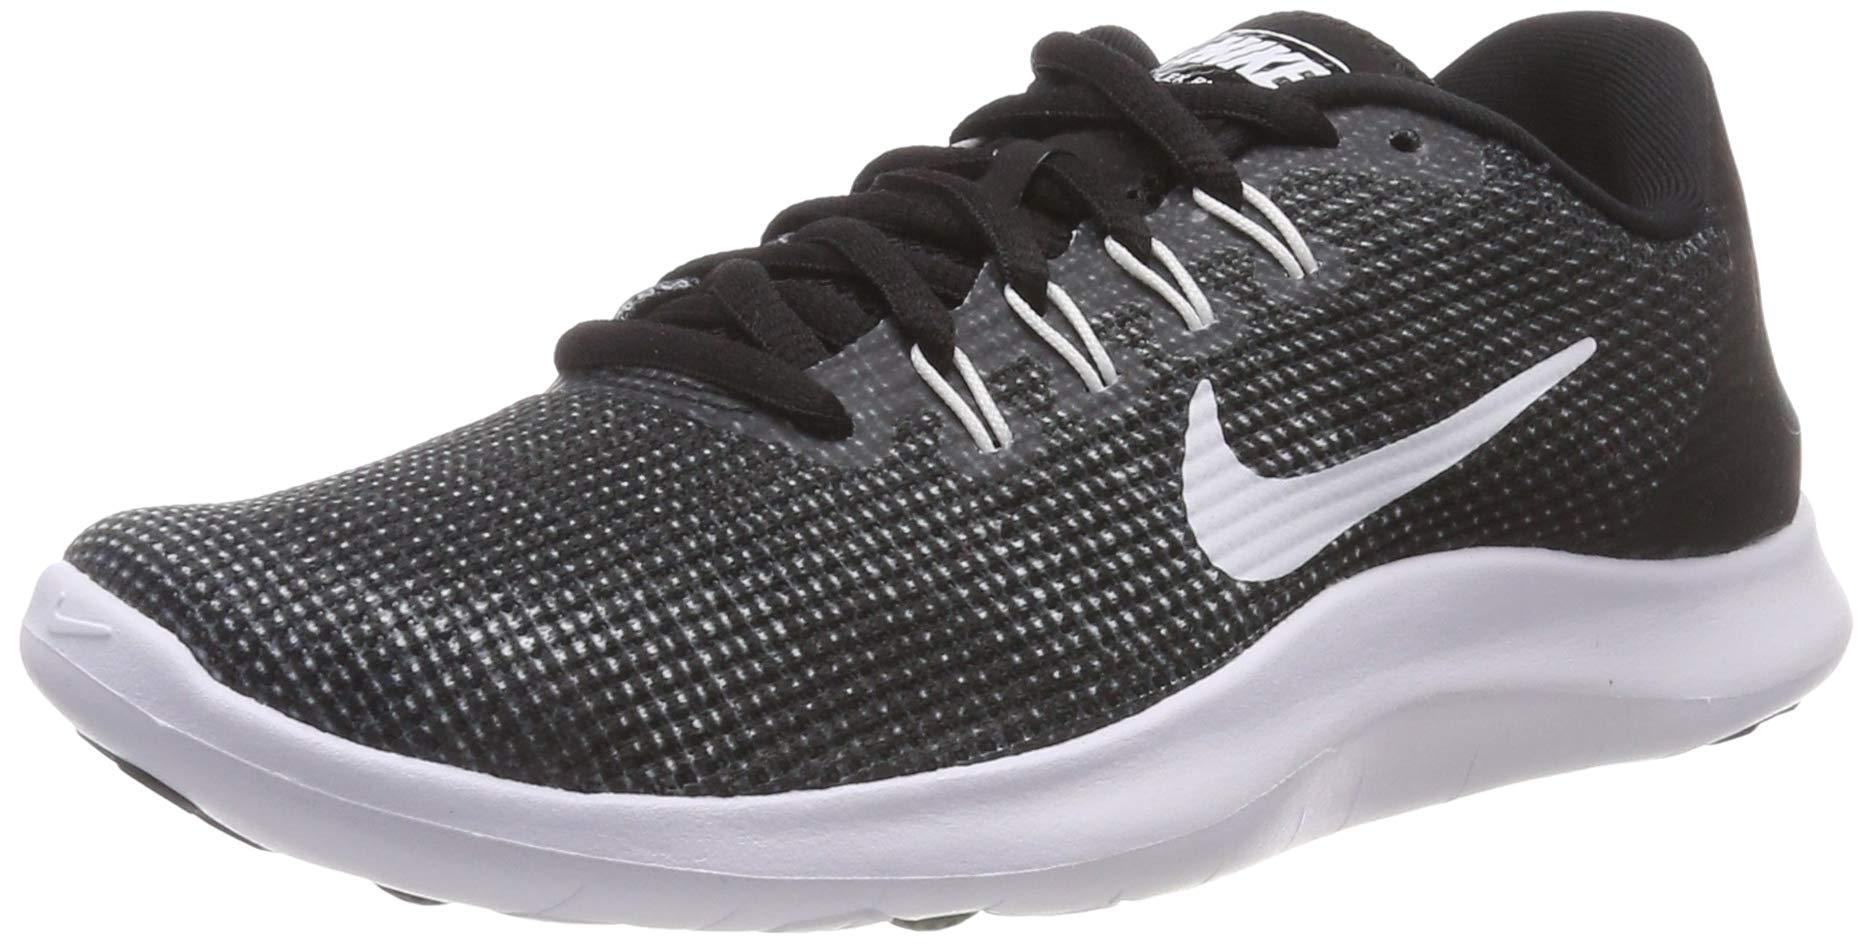 017477f3a779c Nike Women's Flex RN 2018 Running Shoe (10, Black/White)